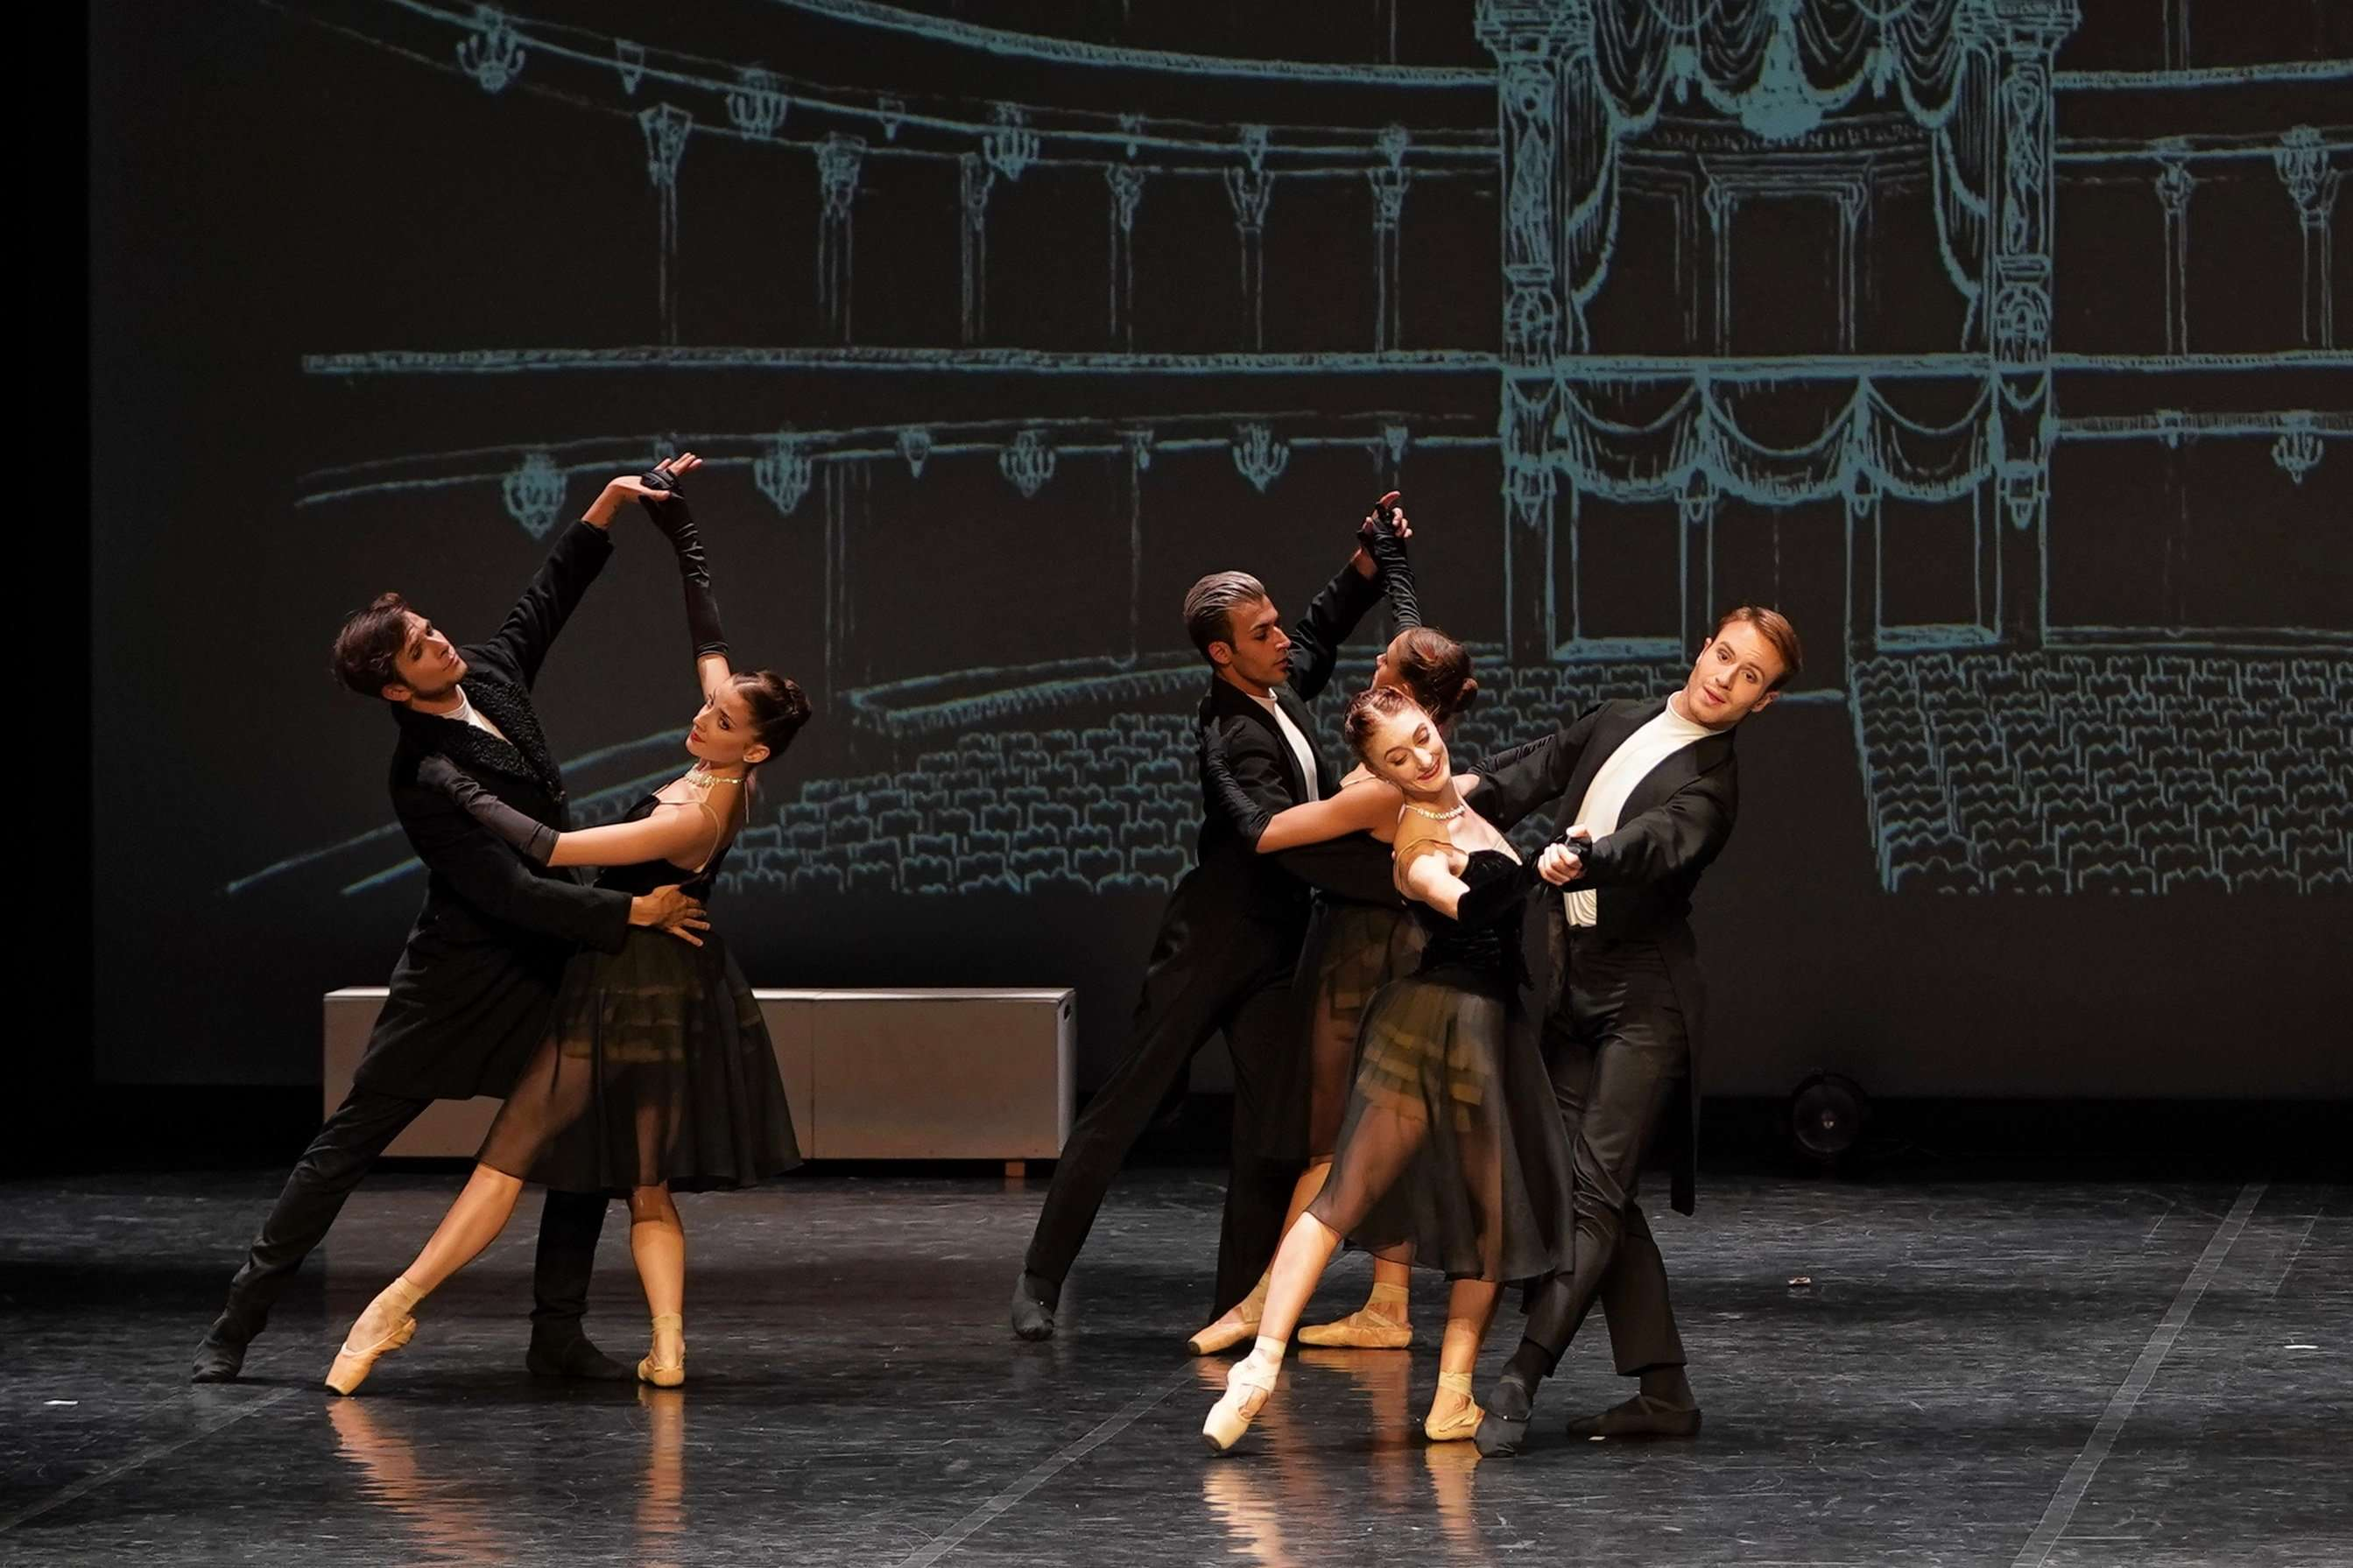 Immagine dal Balletto Anna Karenina